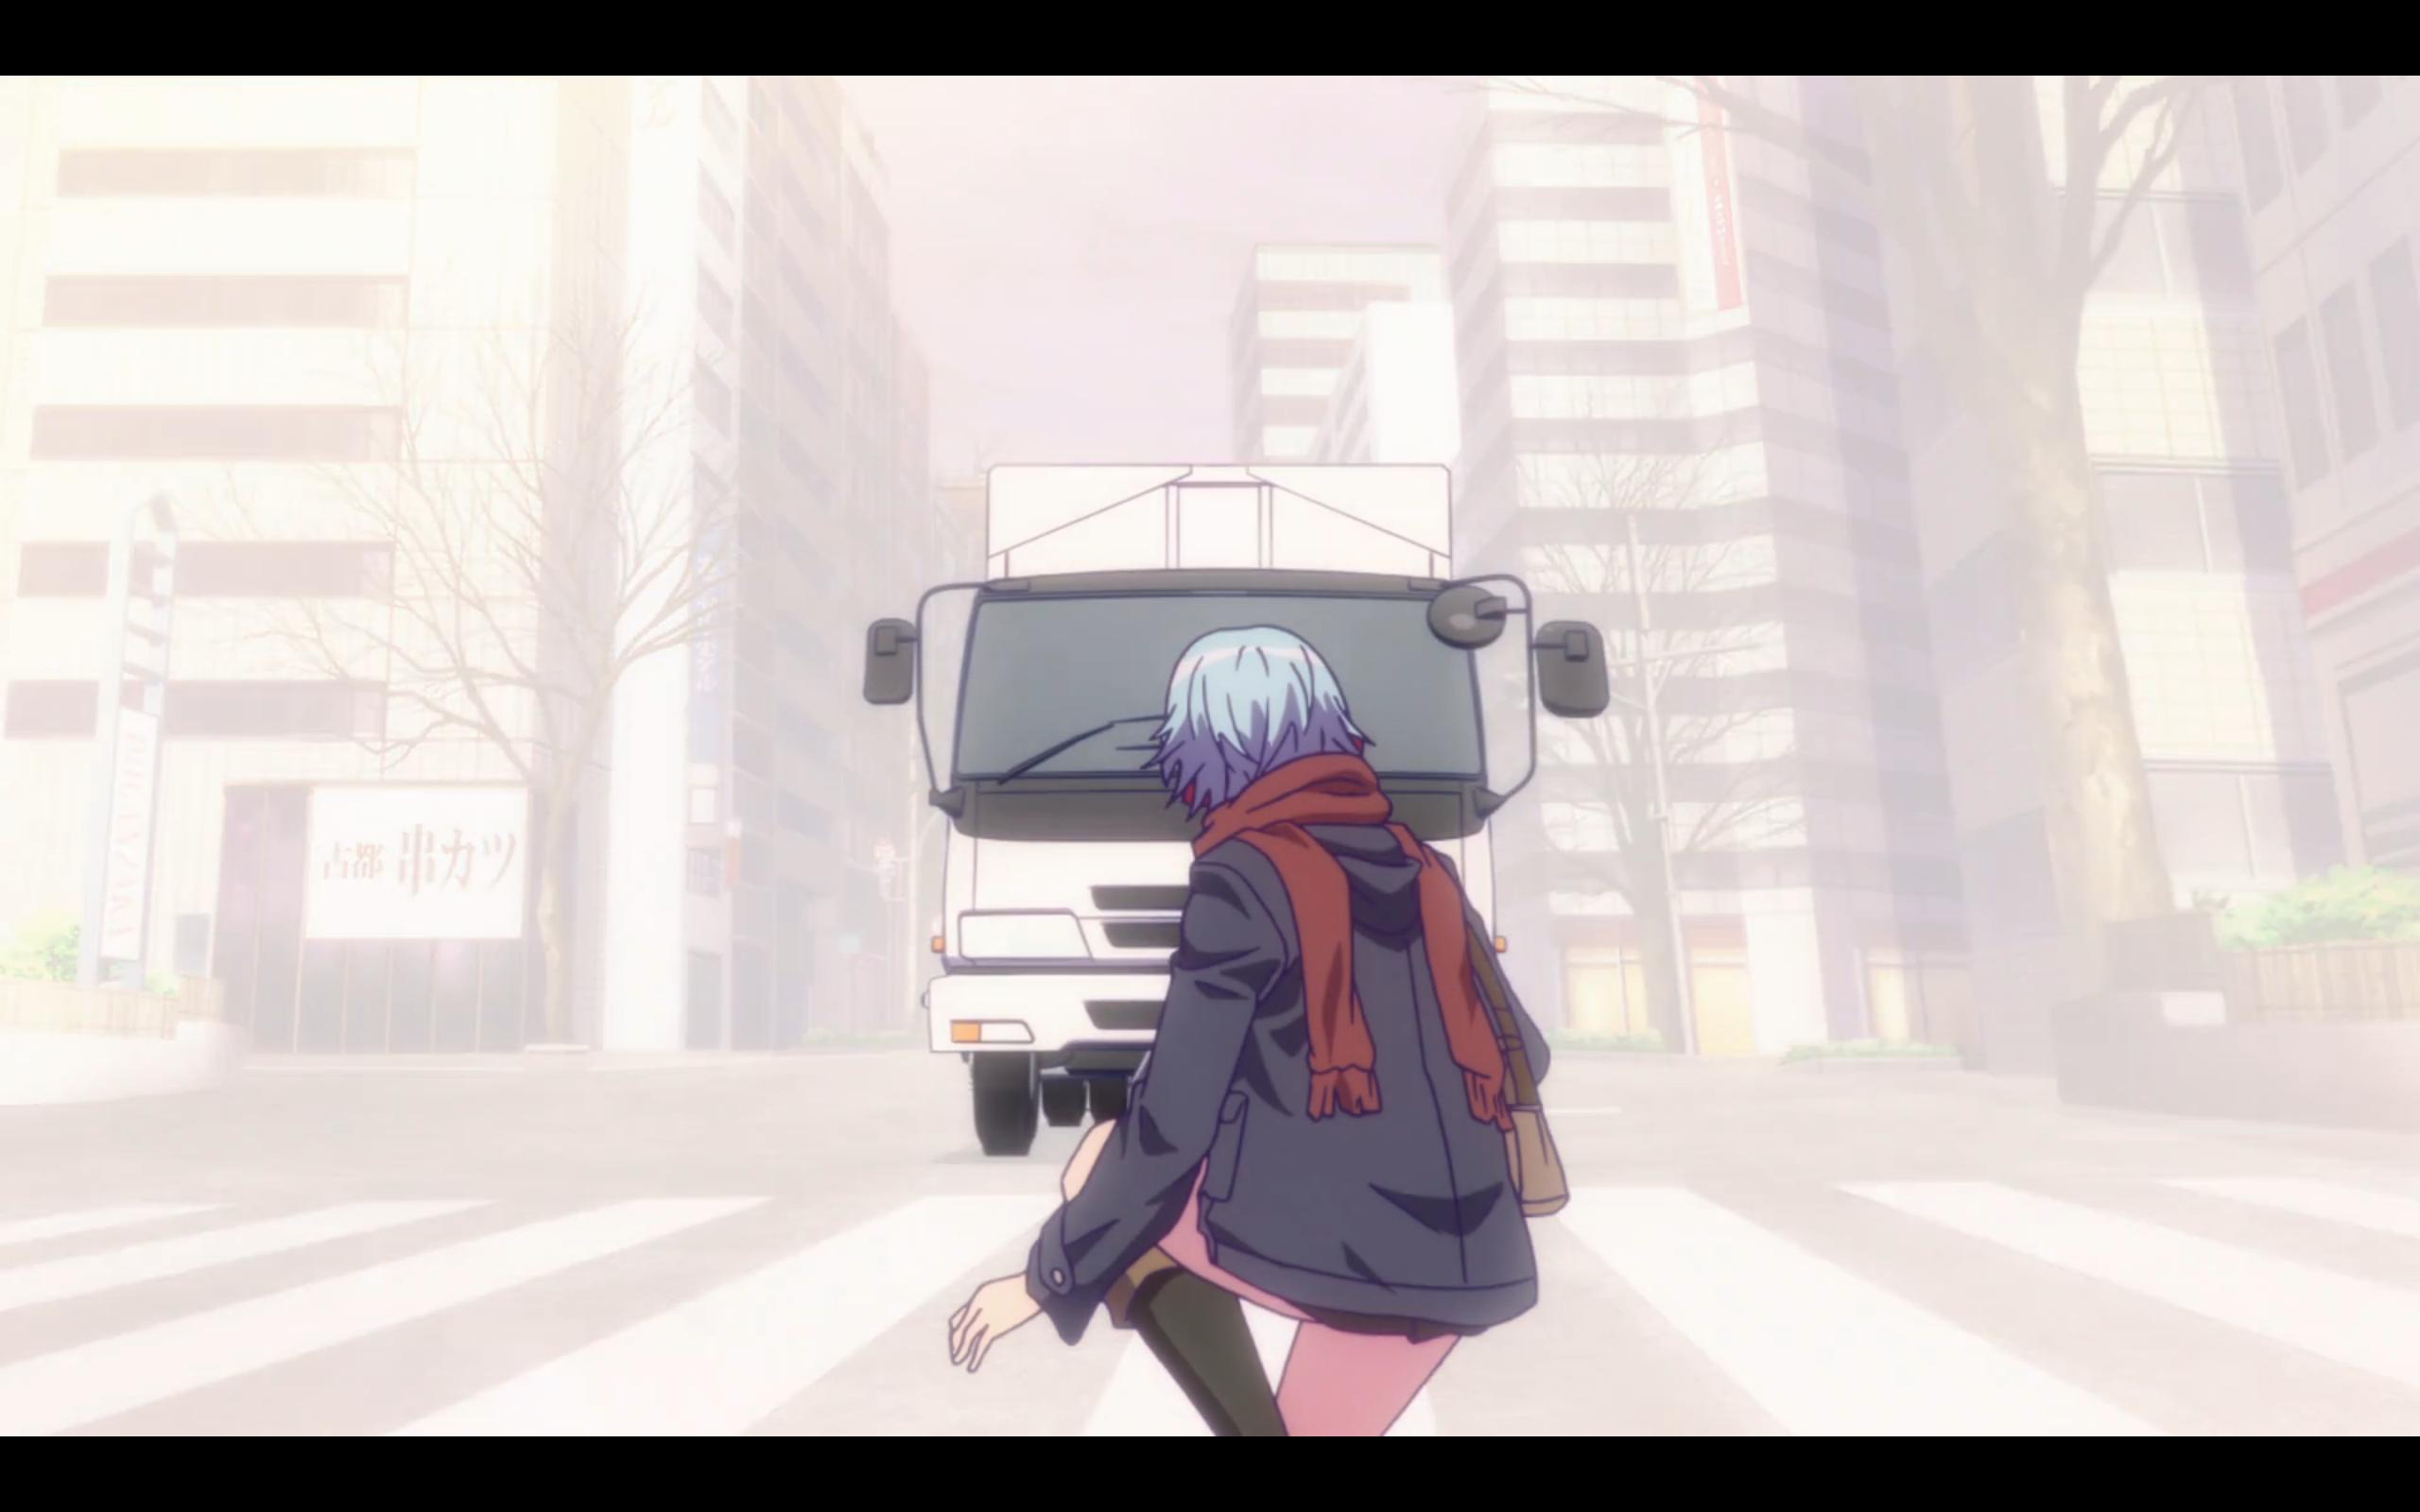 Fuuka mangaka Kouji Seo talks about the change in the anime for the infamous truck scene (SPOILER WARNING) - http://sgcafe.com/2017/03/fuuka-mangaka-kouji-seo-talks-change-anime-infamous-truck-scene-spoiler-warning/